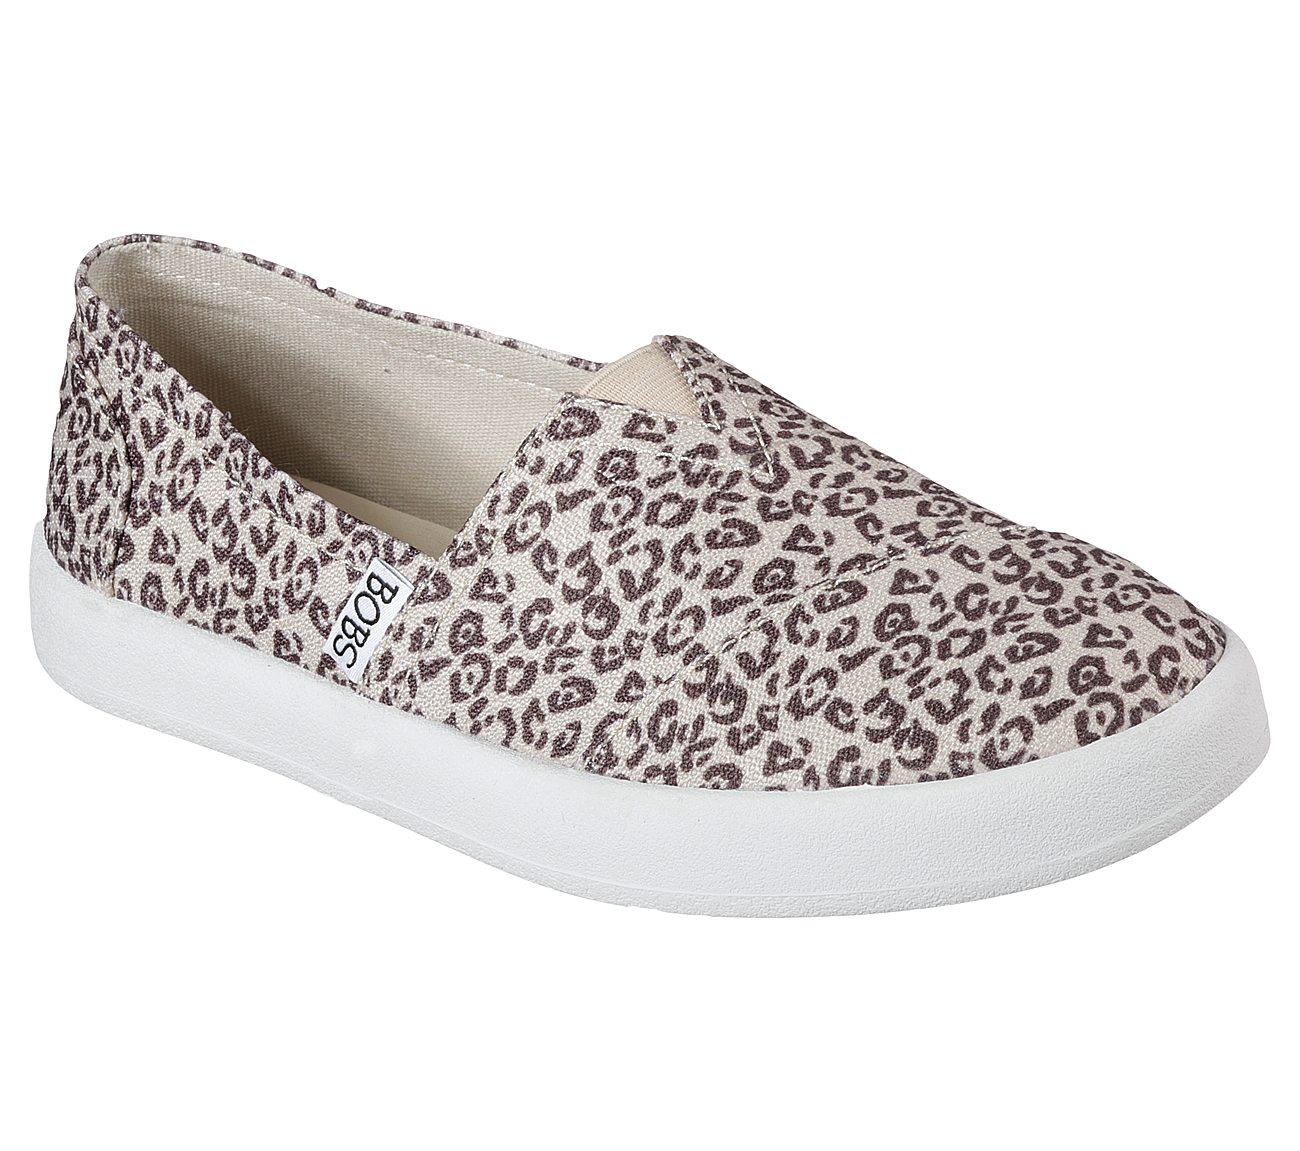 bob's animal print shoes \u003e Factory Store